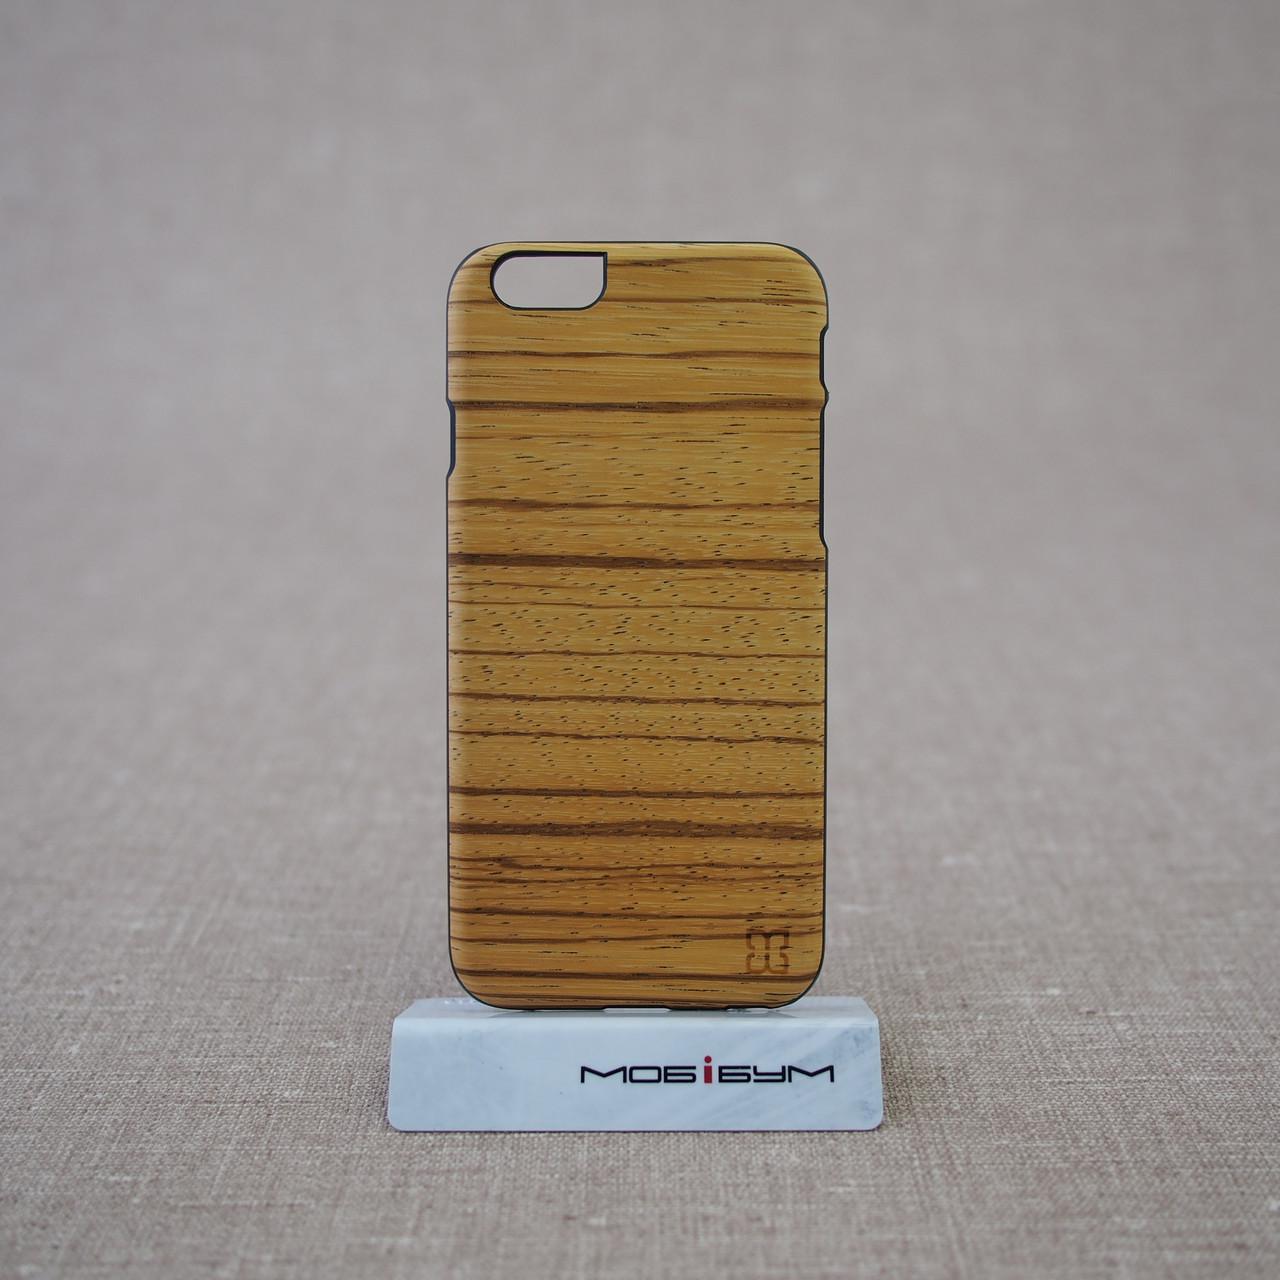 Чехол Mannwood Wood iPhone 6 Zebrano/black EAN/UPC: 8809339476959